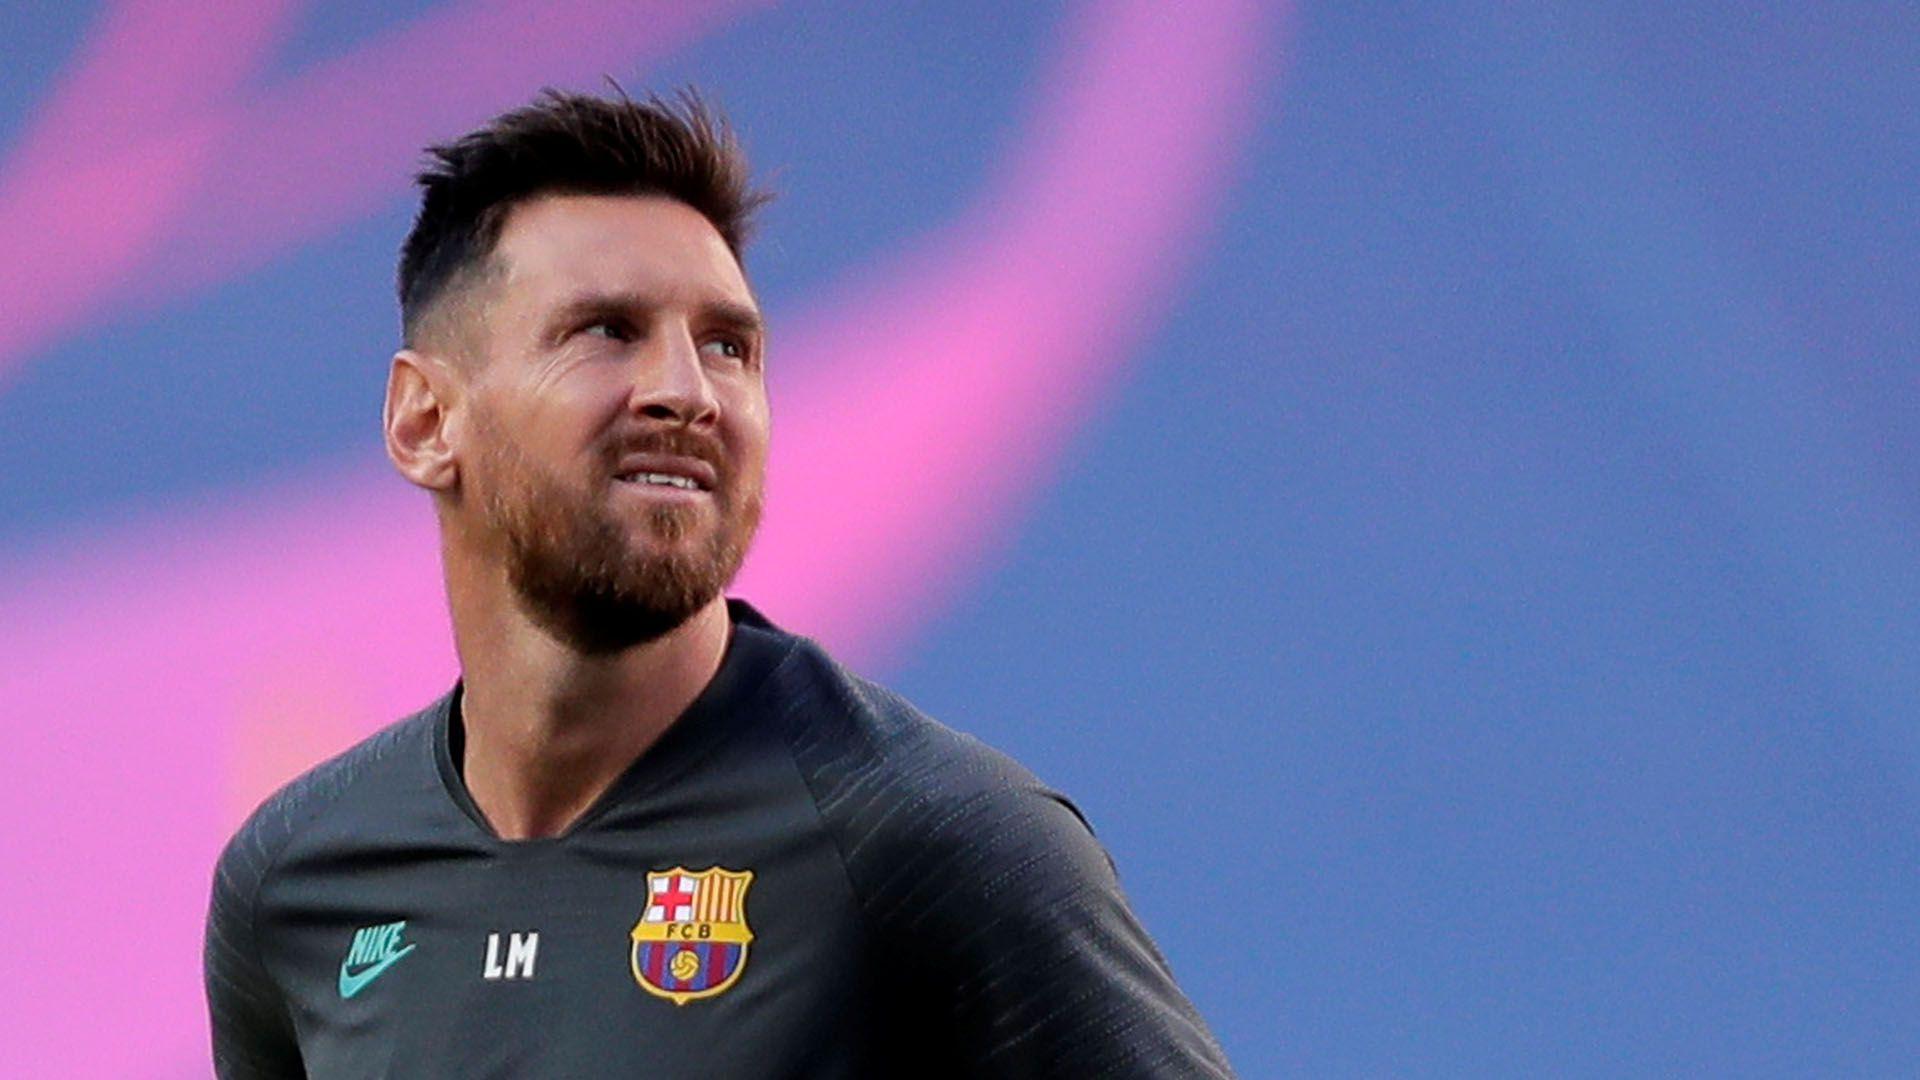 Champions League - FC Barcelona Training